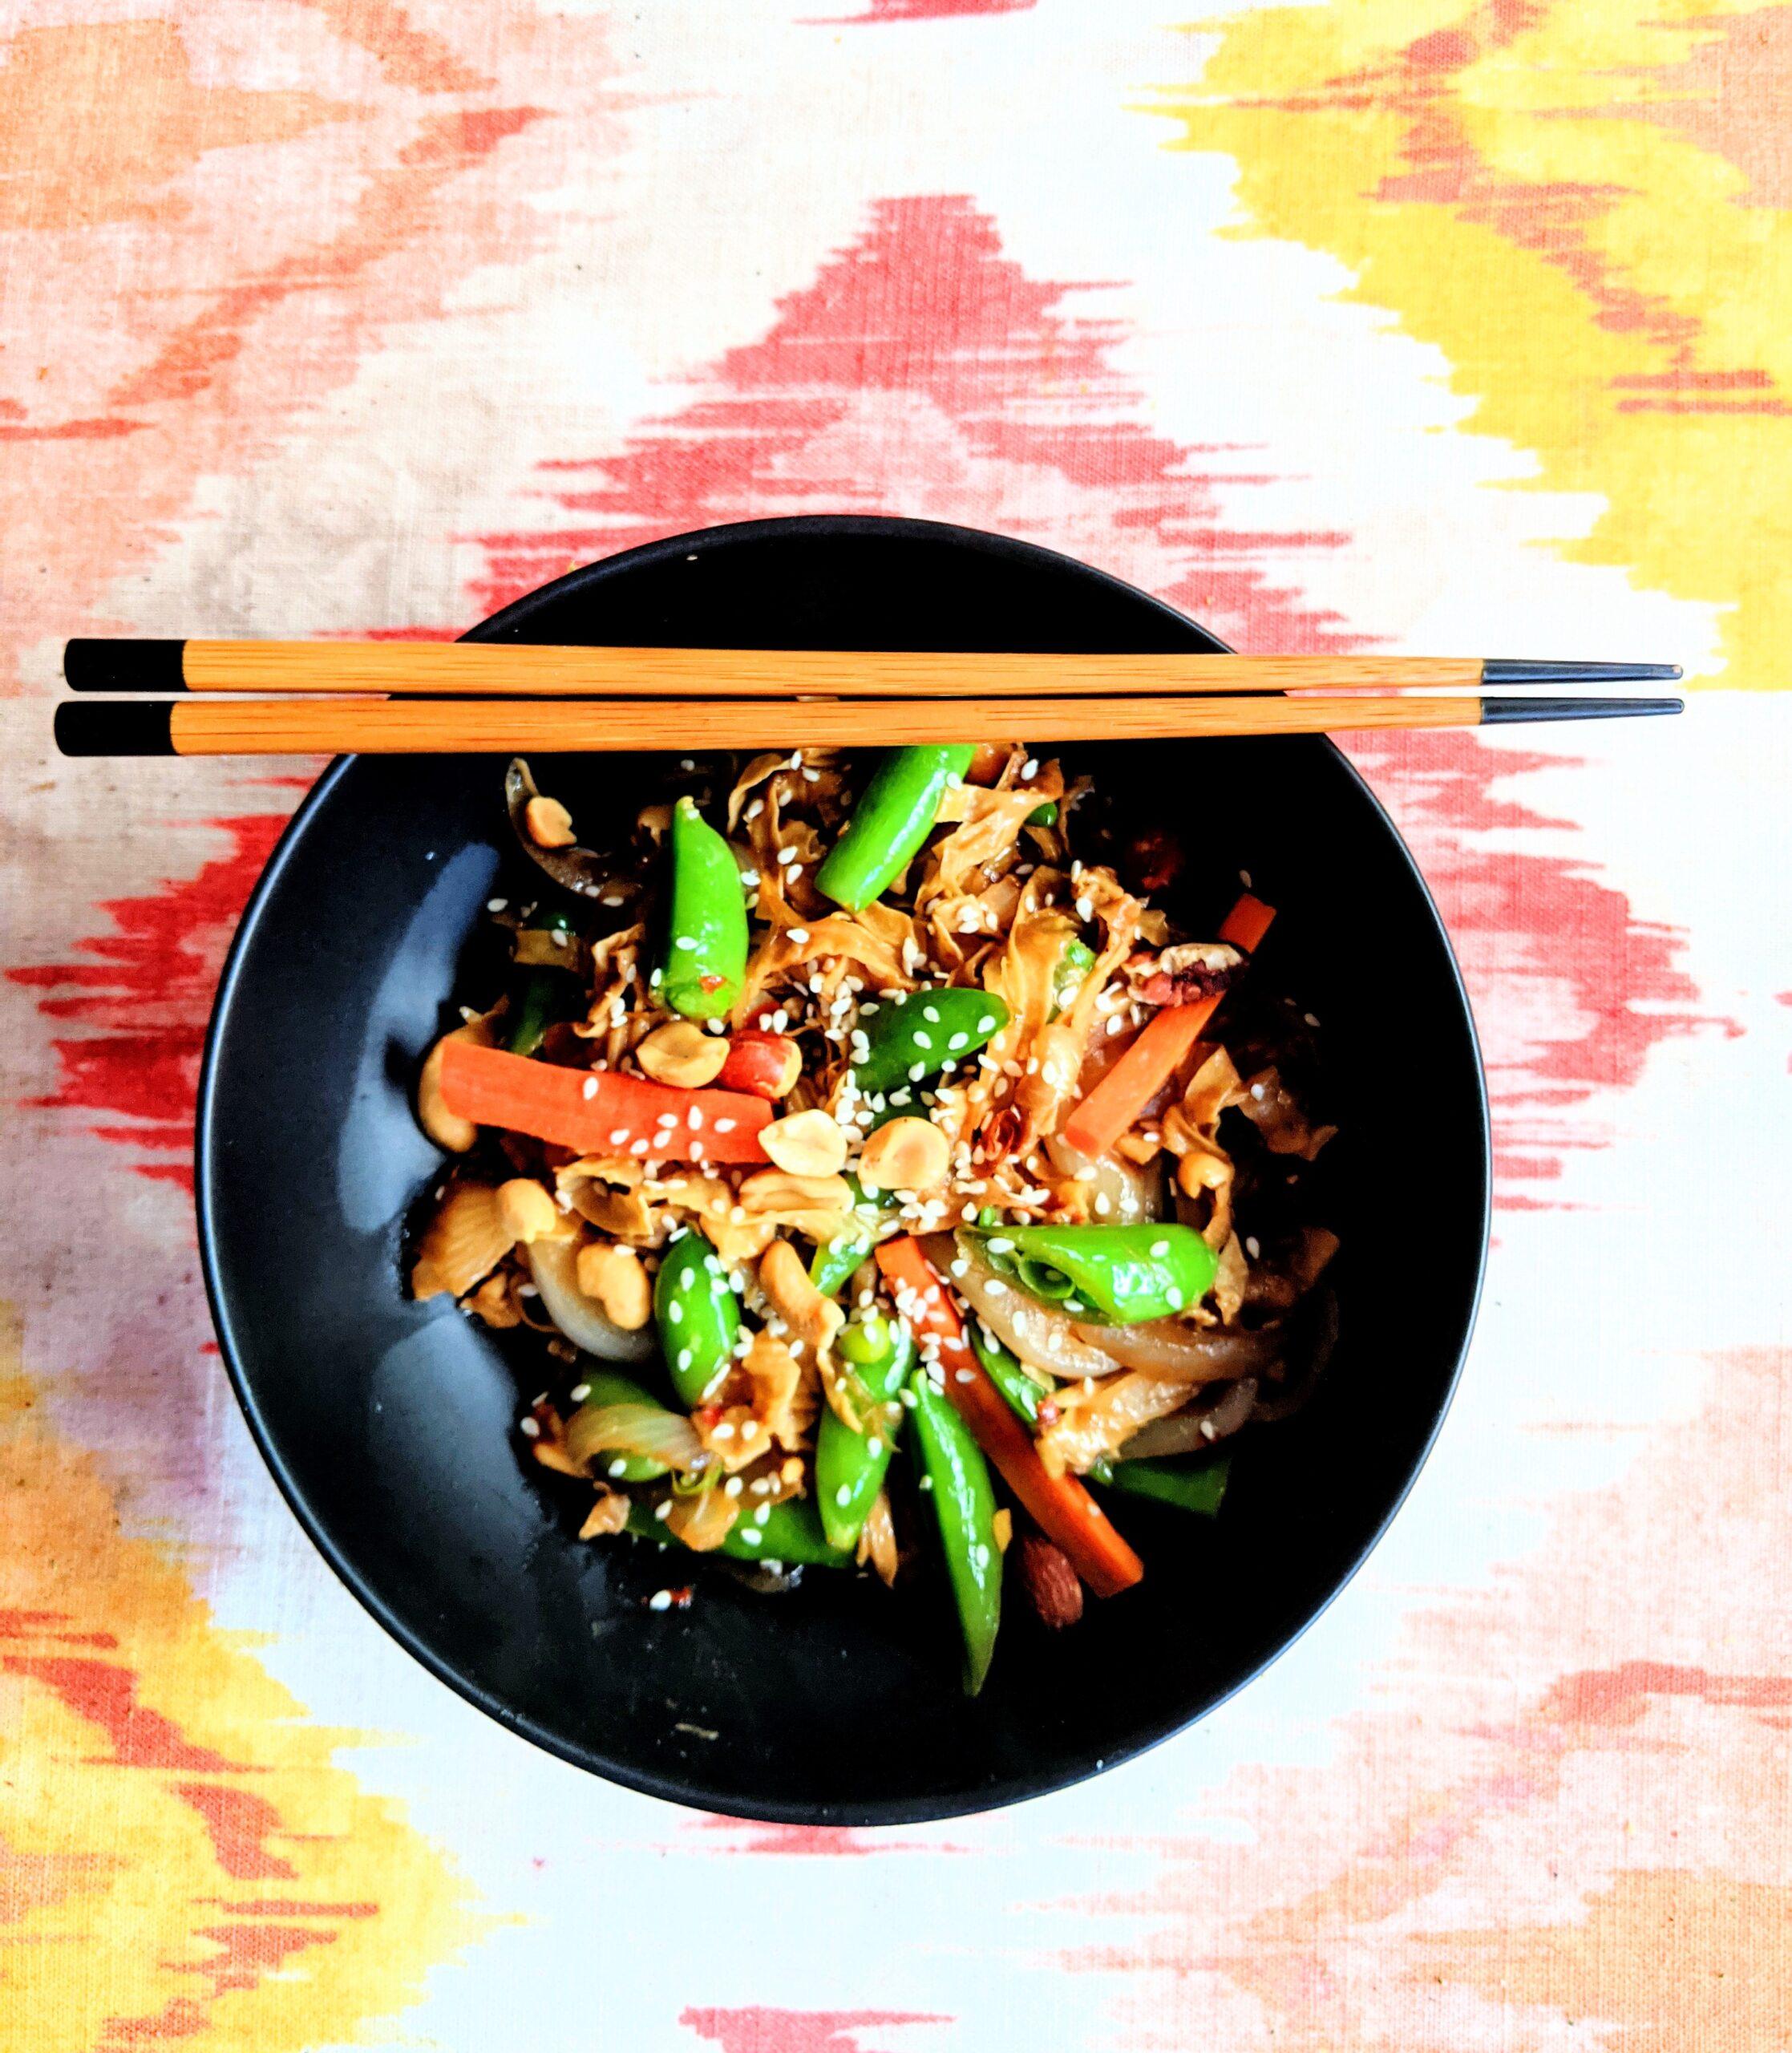 Yuba noodle bowl